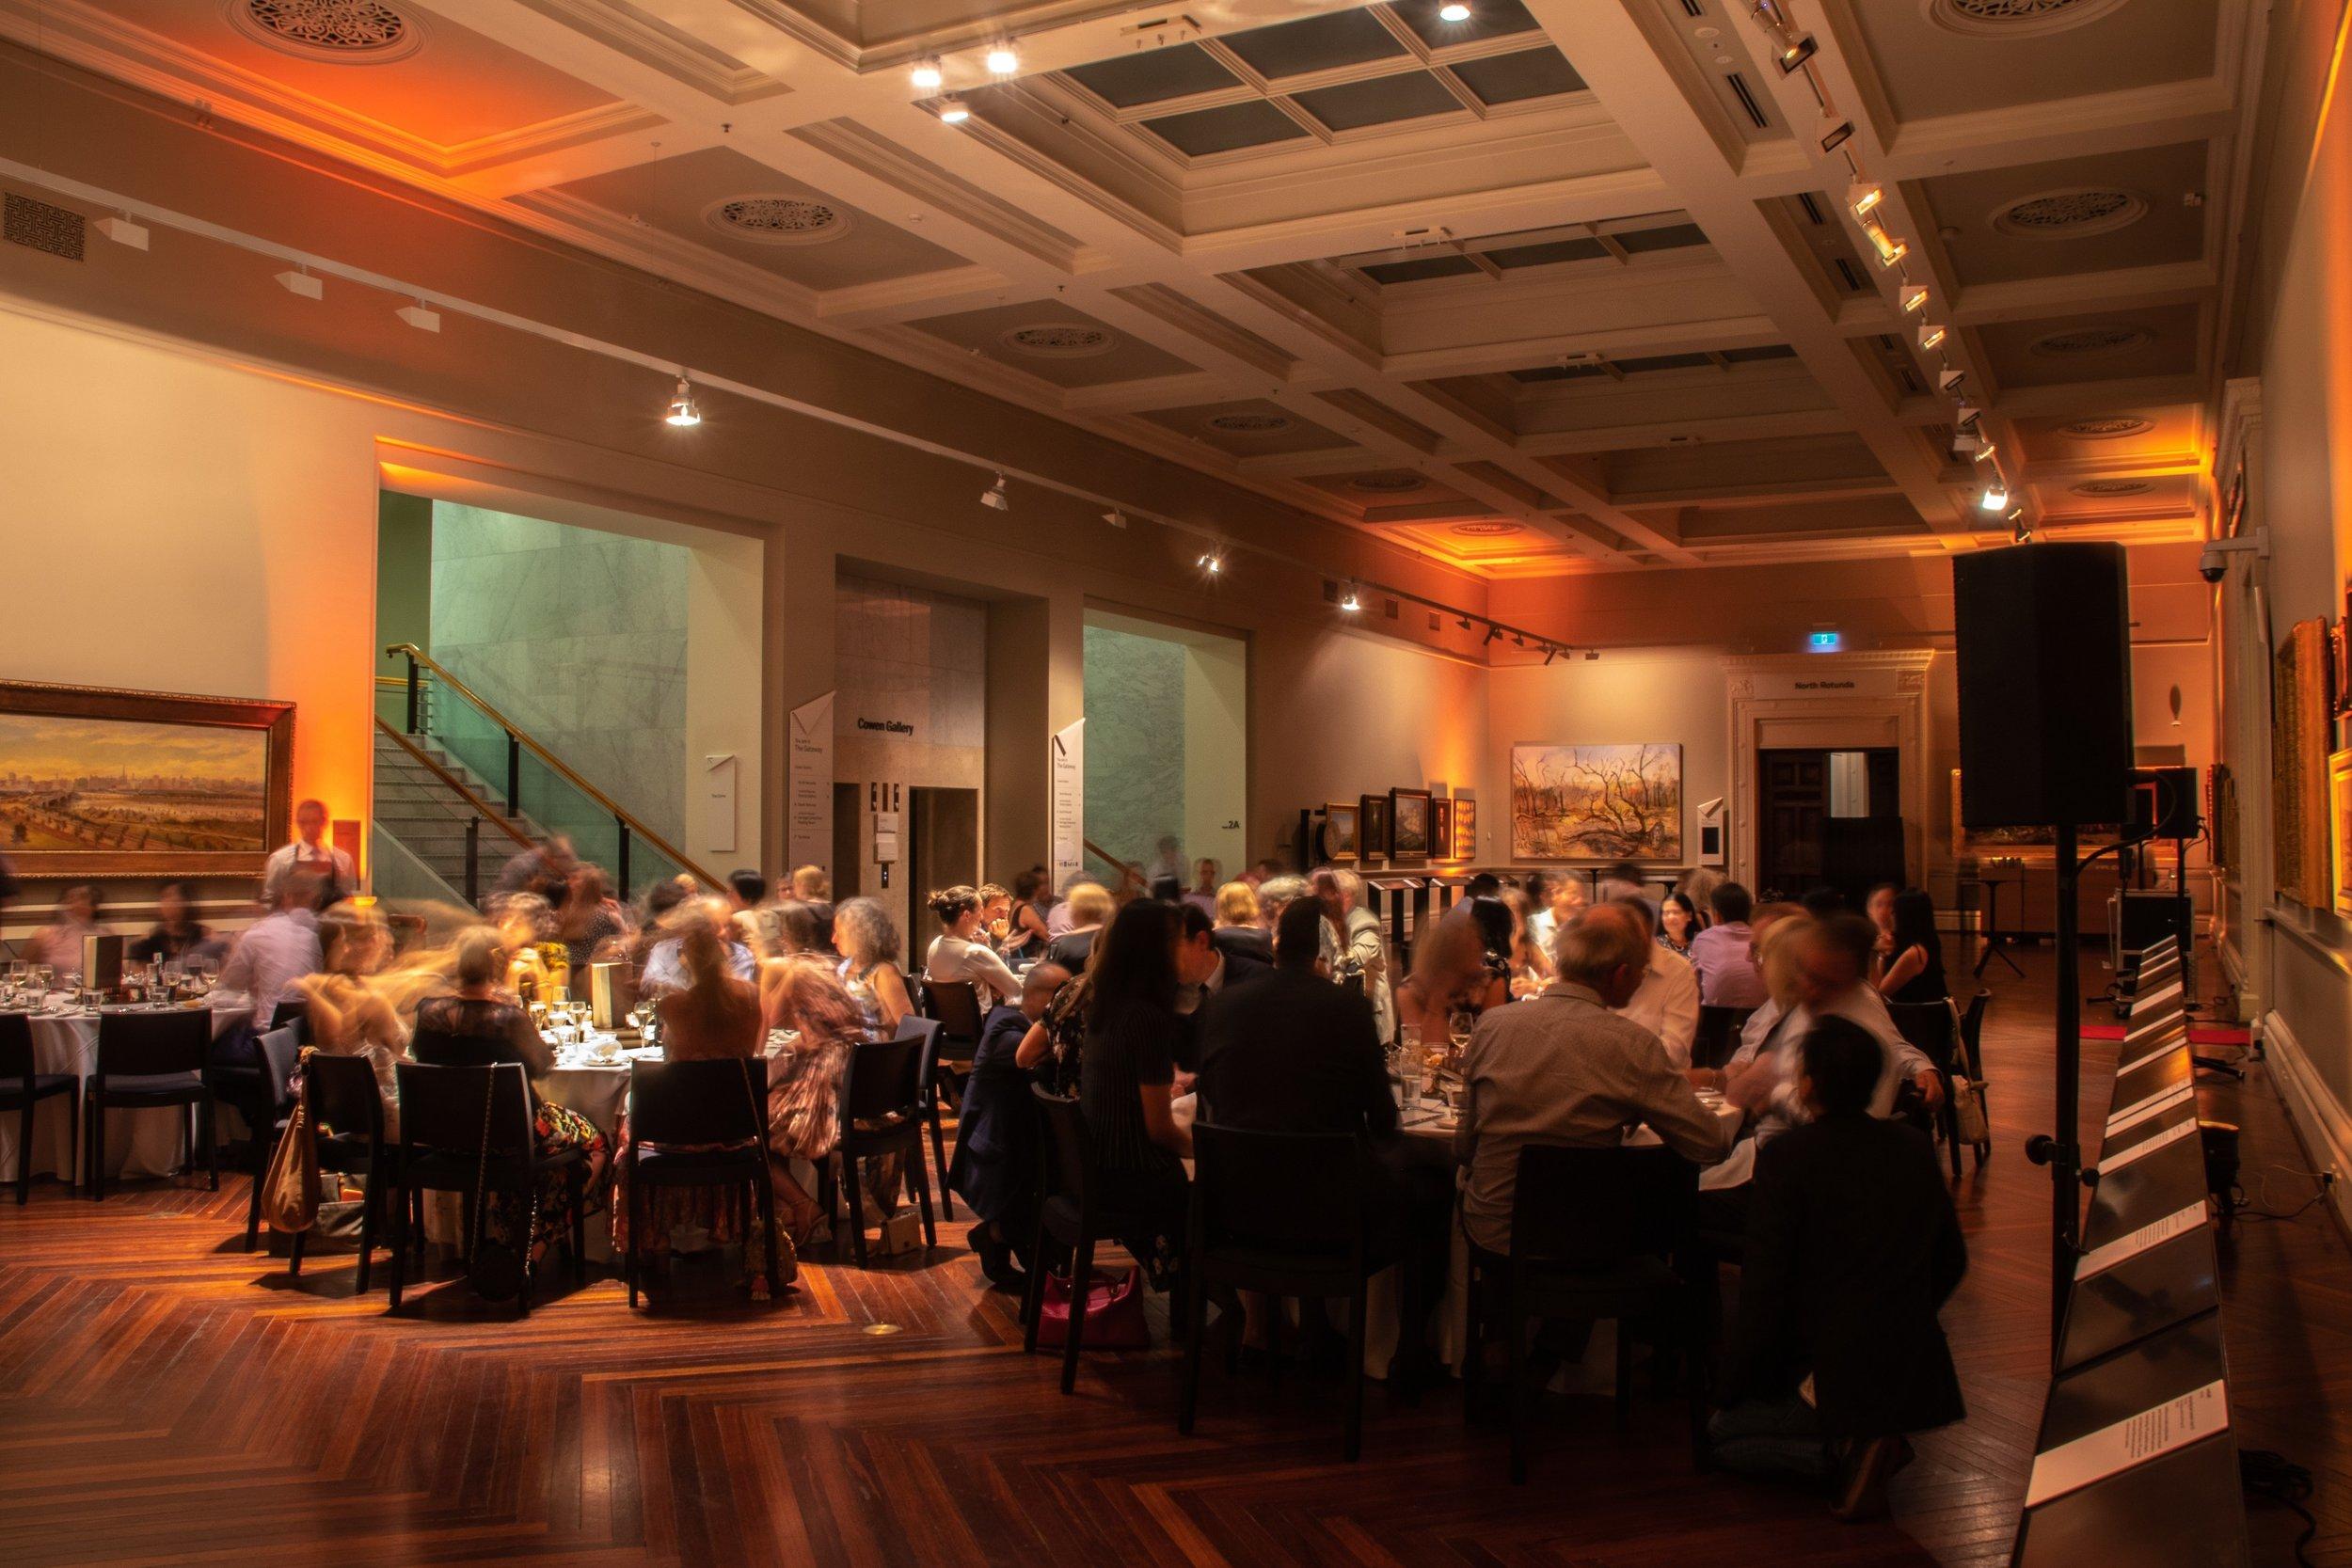 Cowen Gallery Dinner.jpg